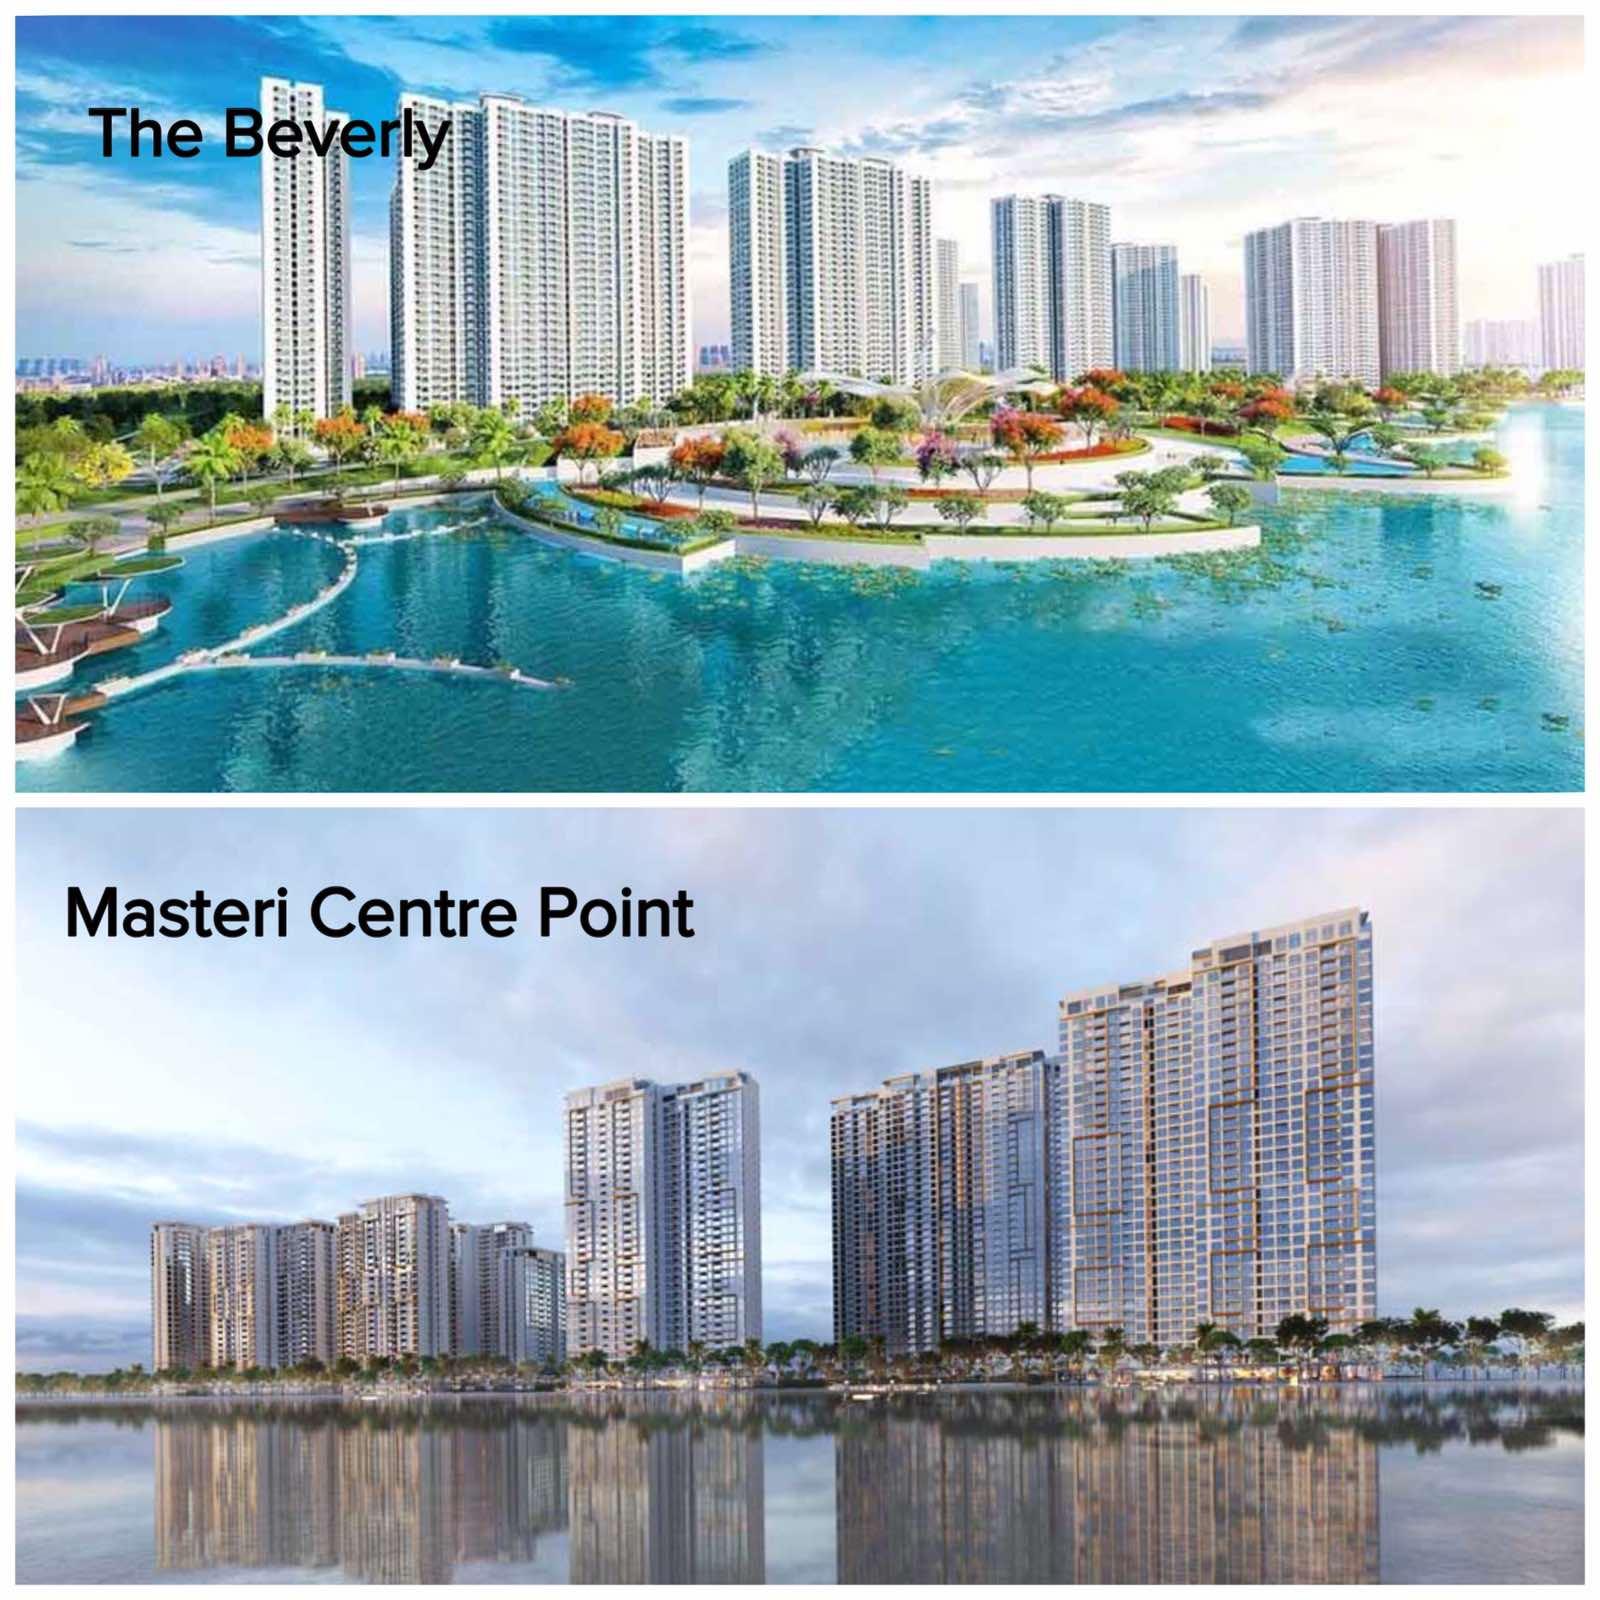 So sánh căn hộ The Beverly với Masteri Centre Point